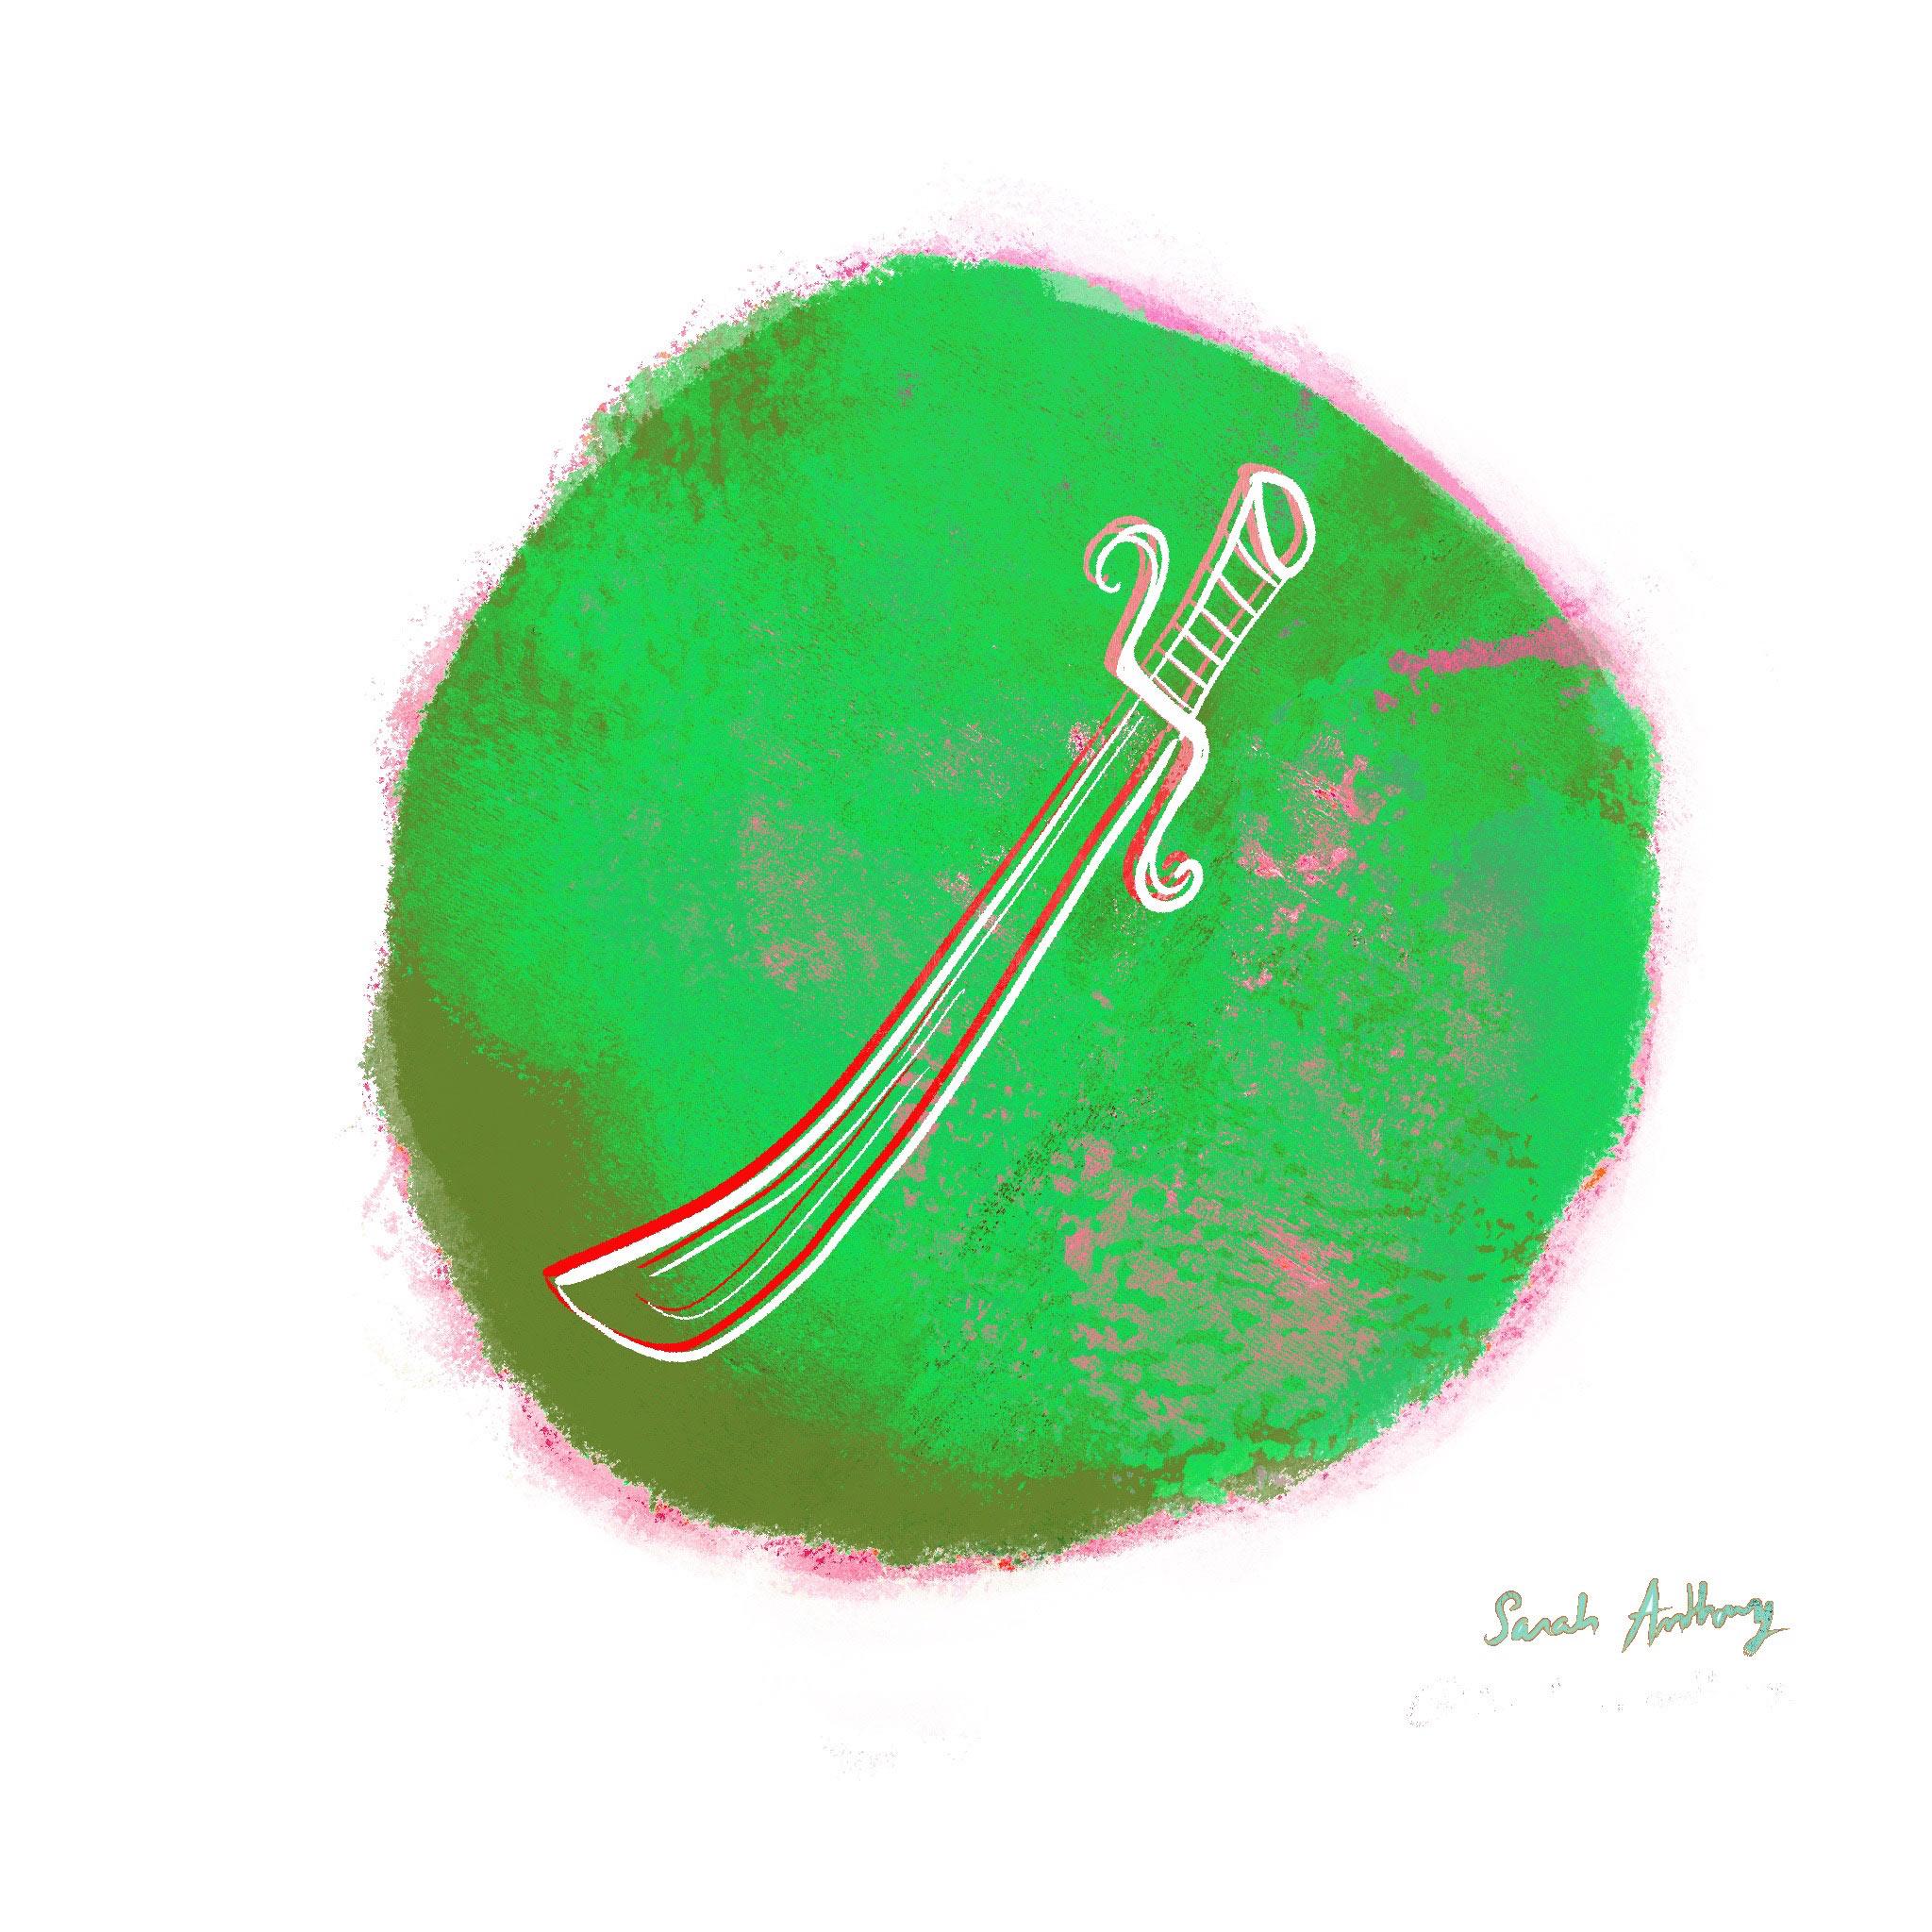 janissaire-sarah-anthony-reduit